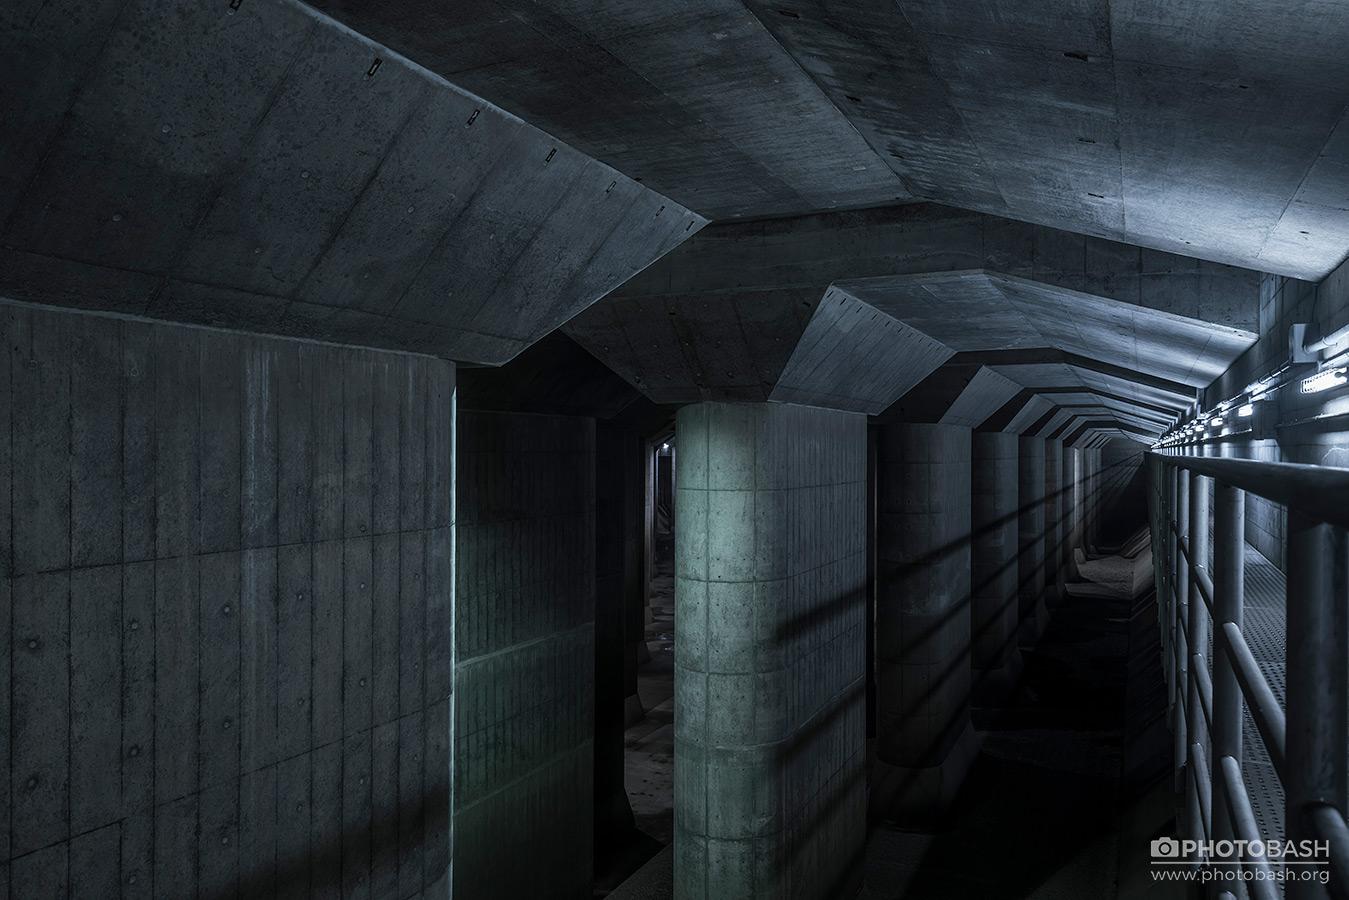 Underground-Facility-Industrial-Tunnel.jpg